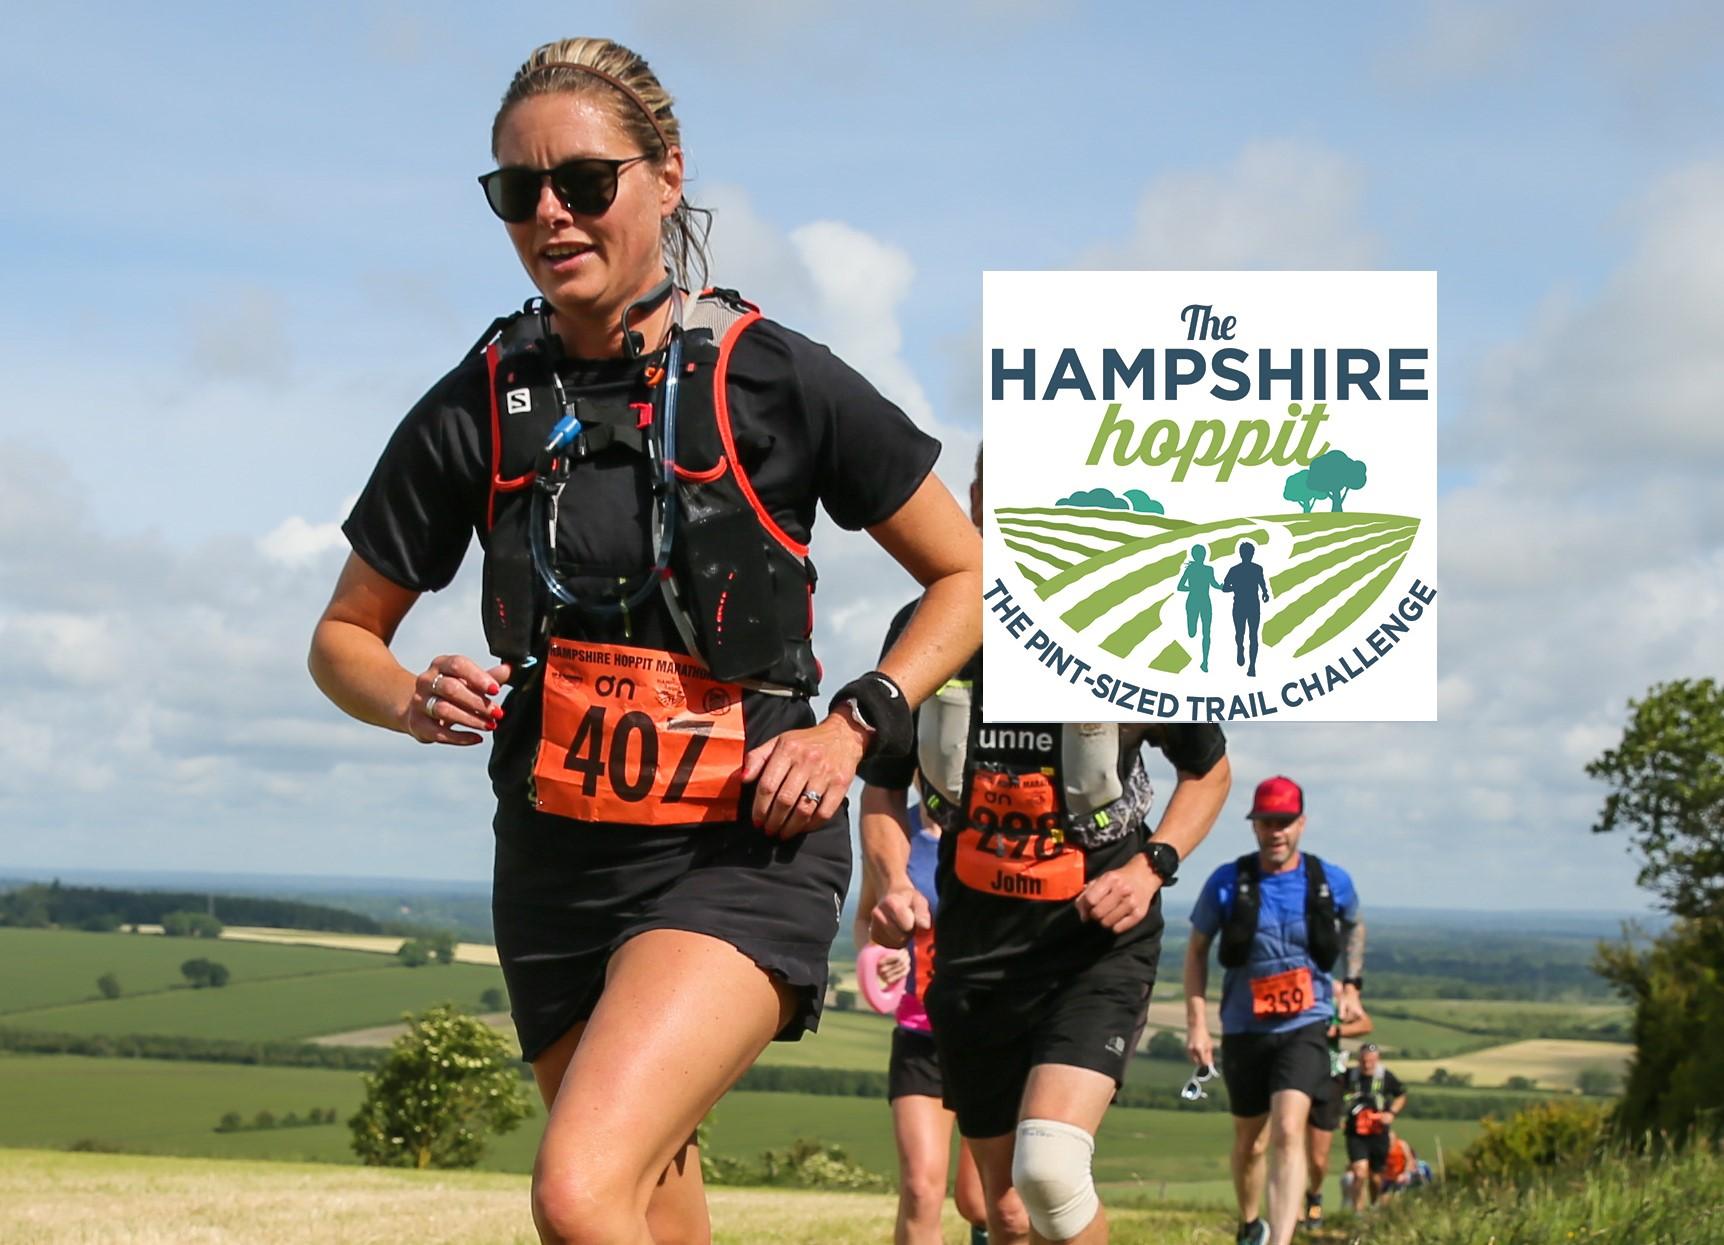 The Hampshire Hoppit Trail Marathon \u0026 Half Marathon - cover image